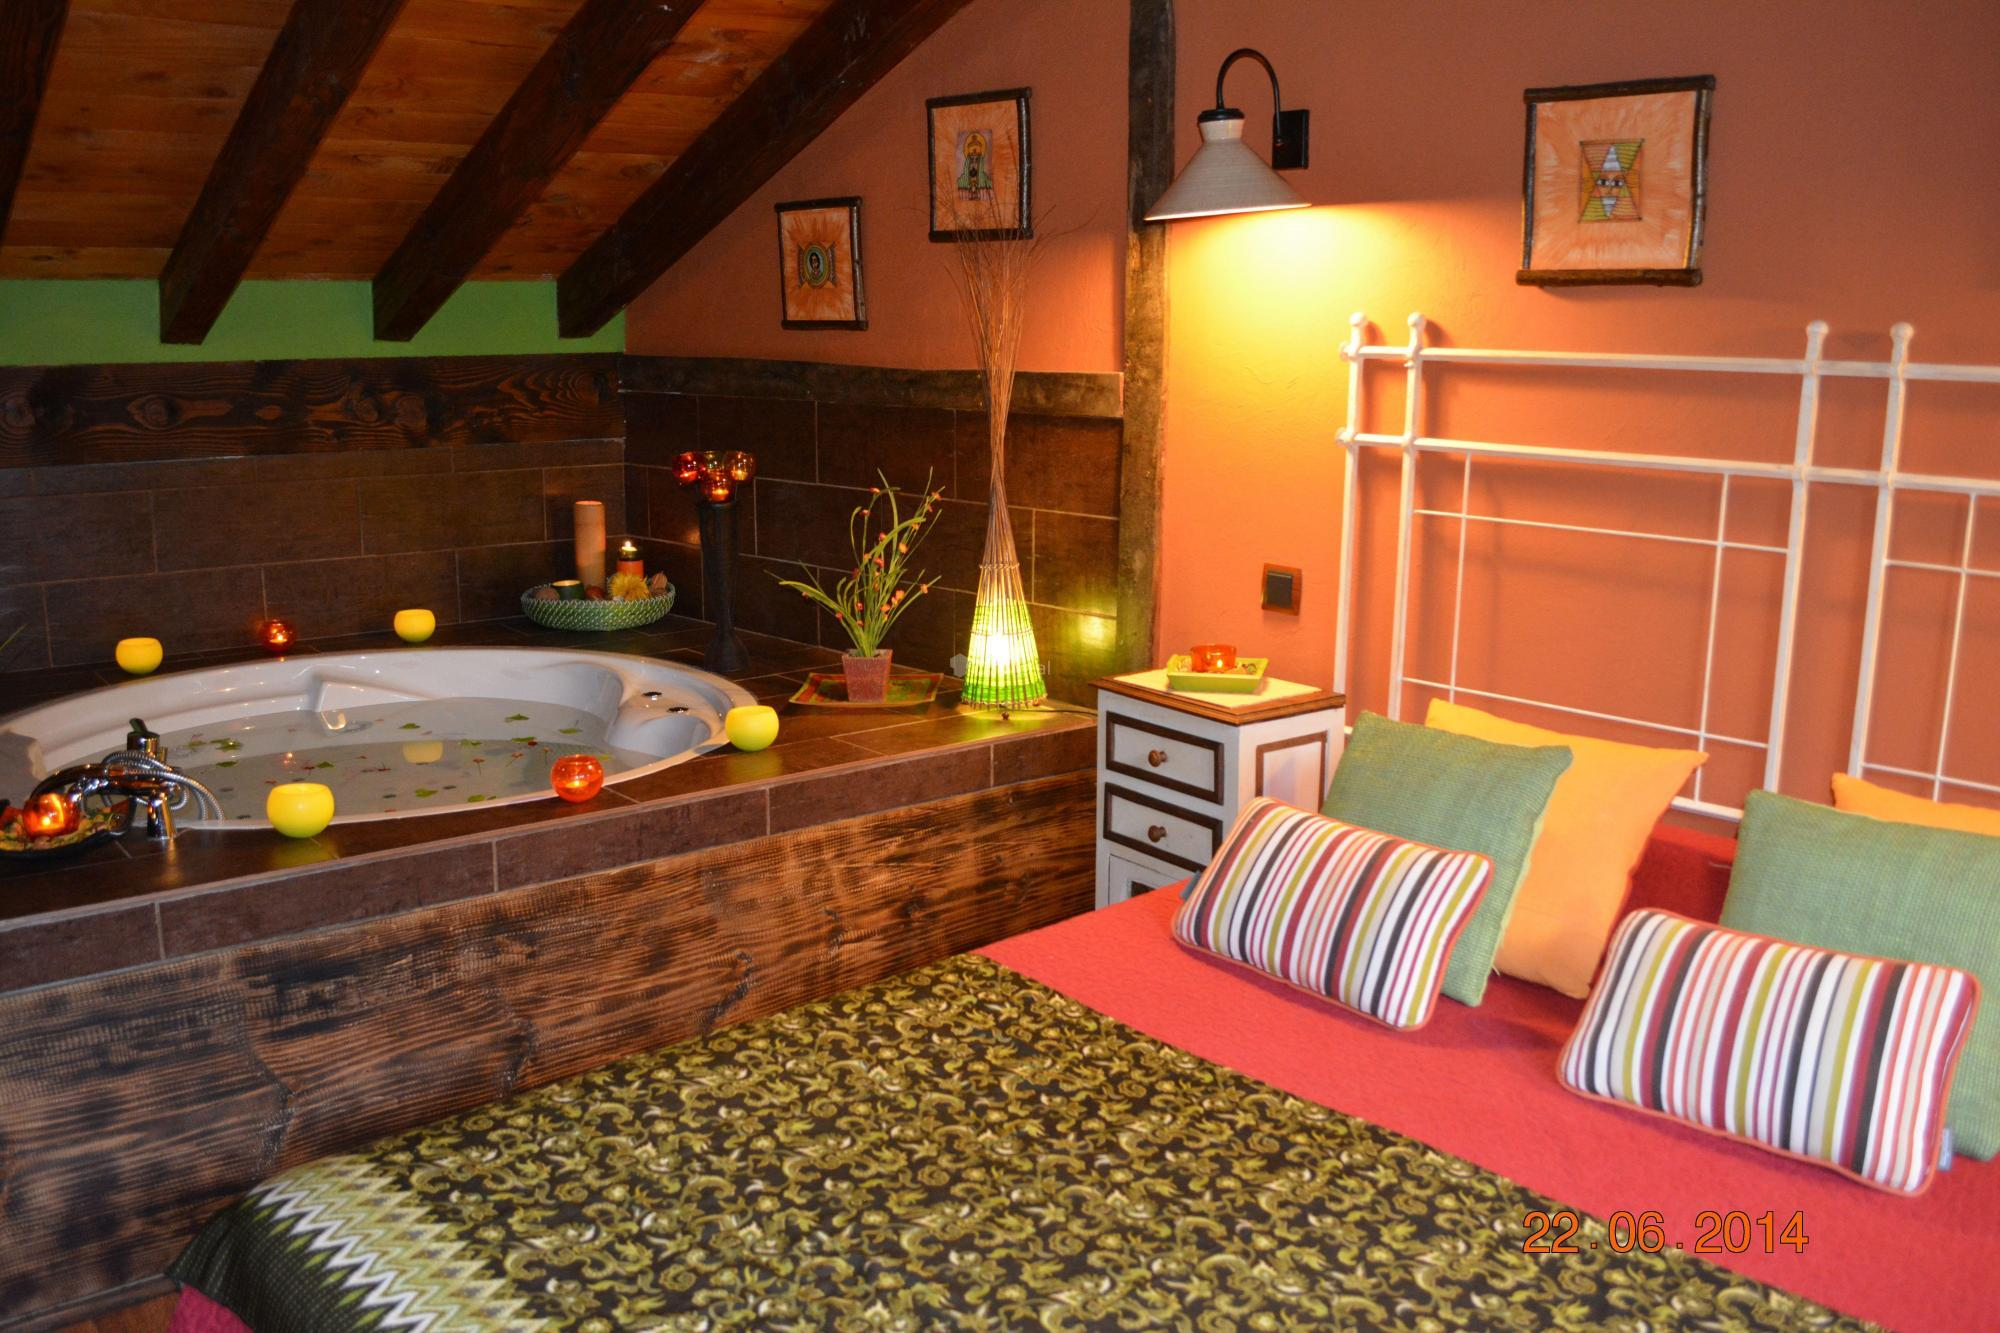 Fotos de La Brcena  Cantabria  Potes  Clubrural